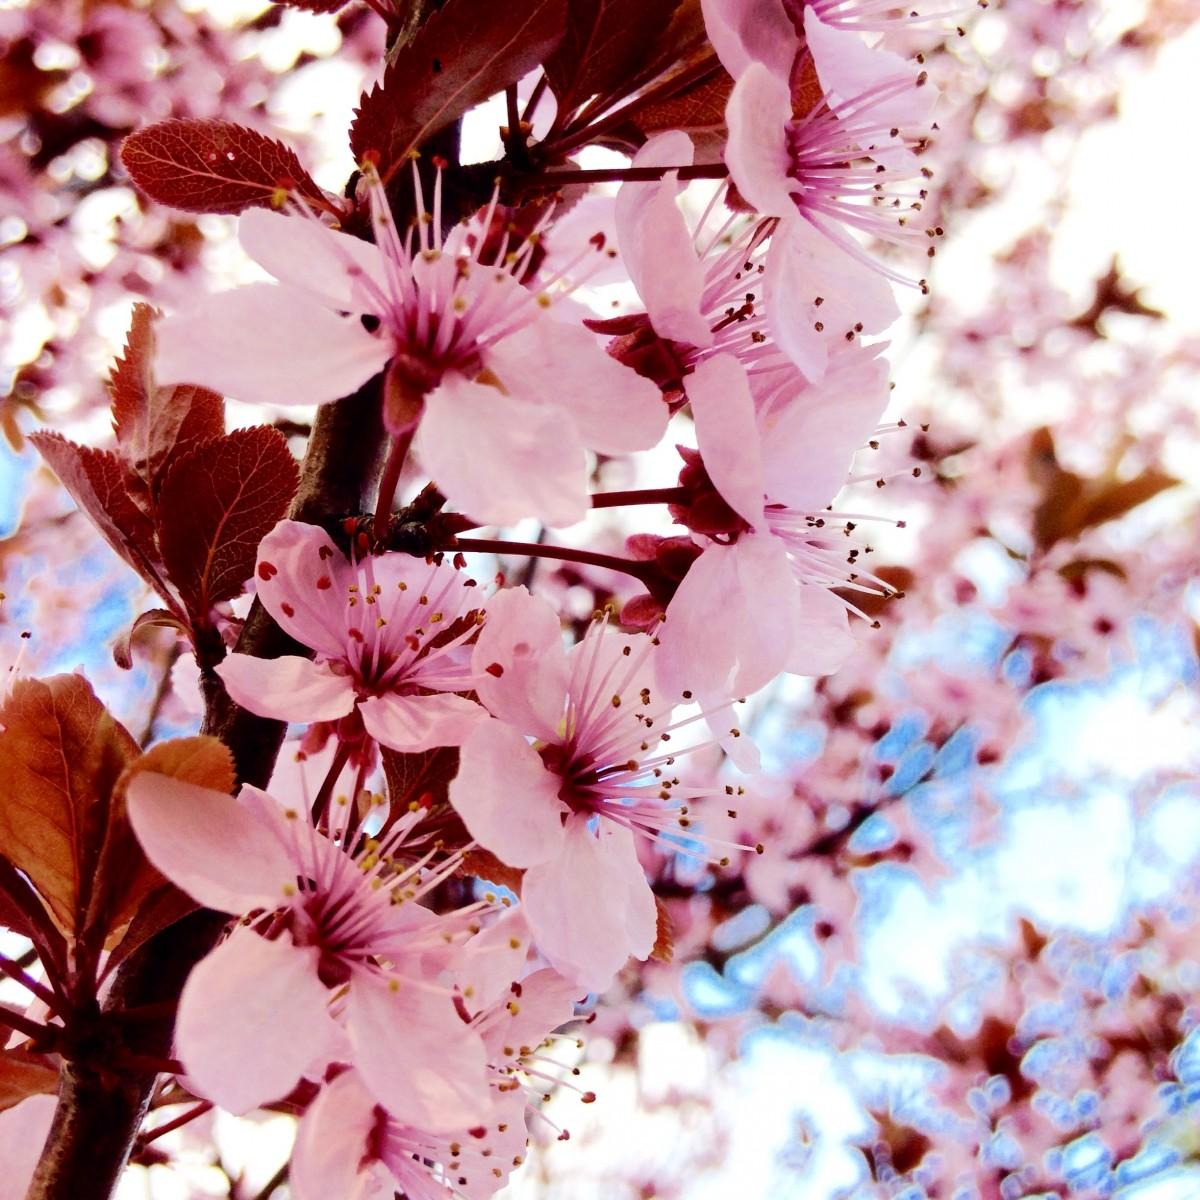 Free Images : Branch, Flower, Petal, Food, Spring, Produce